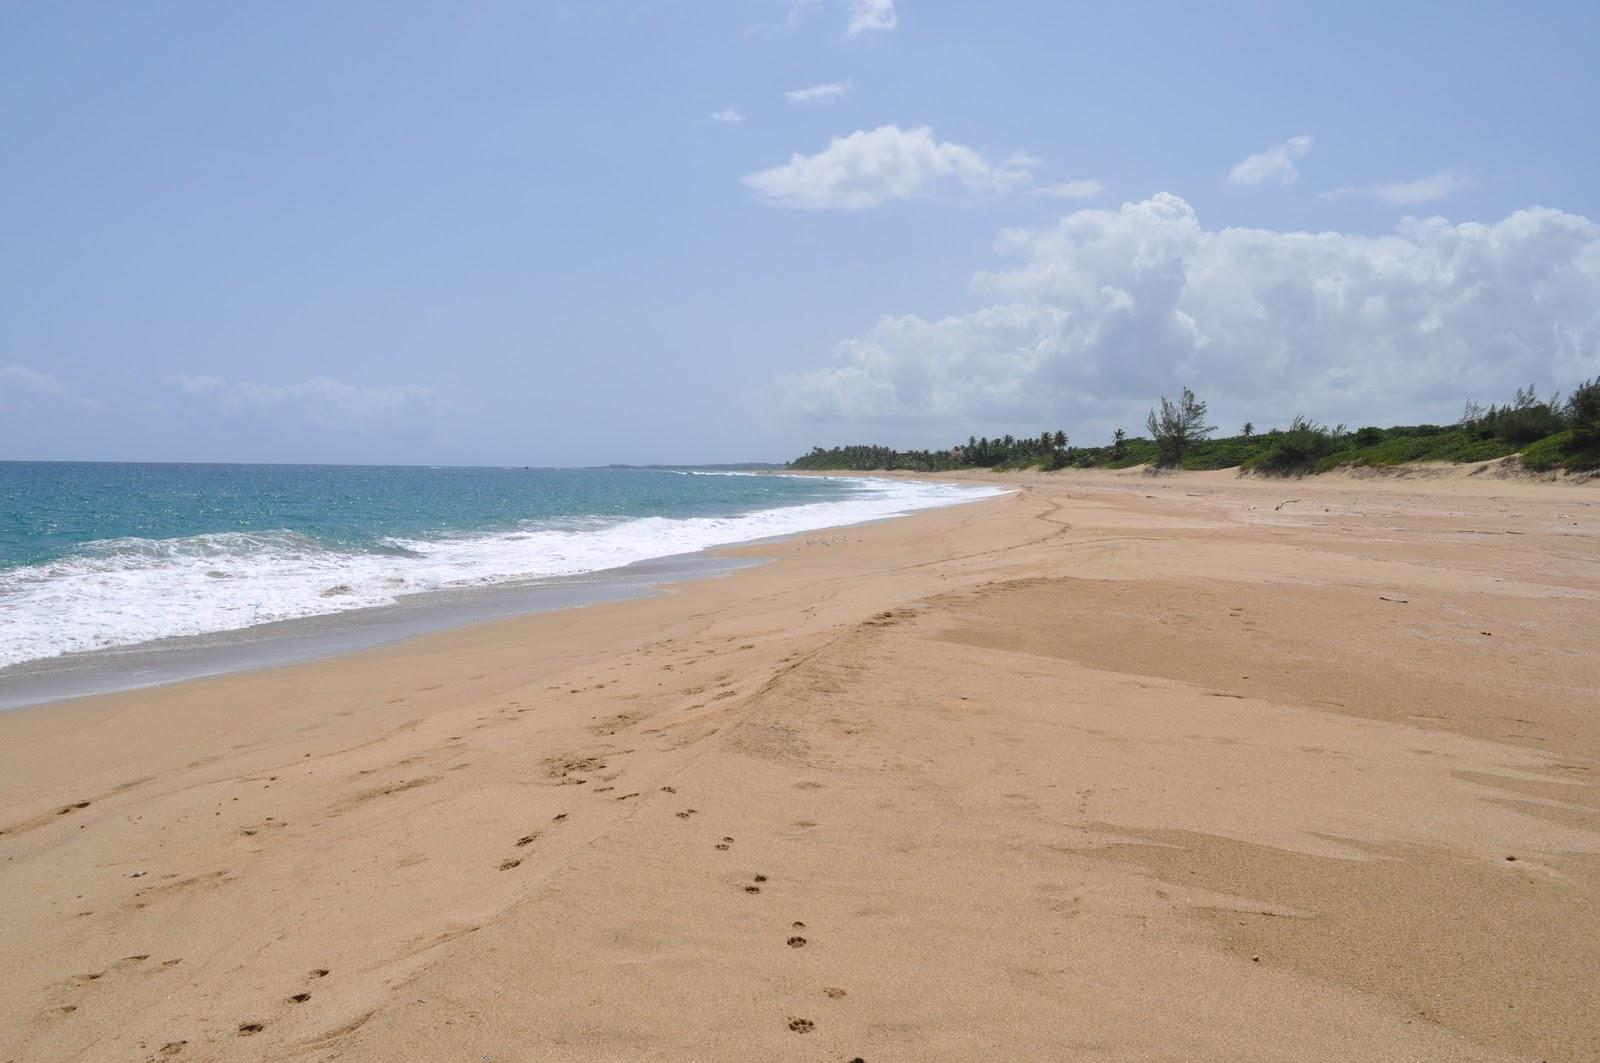 Playa caracoles arecibo puerto rico turismo interno for Turismo interno p r